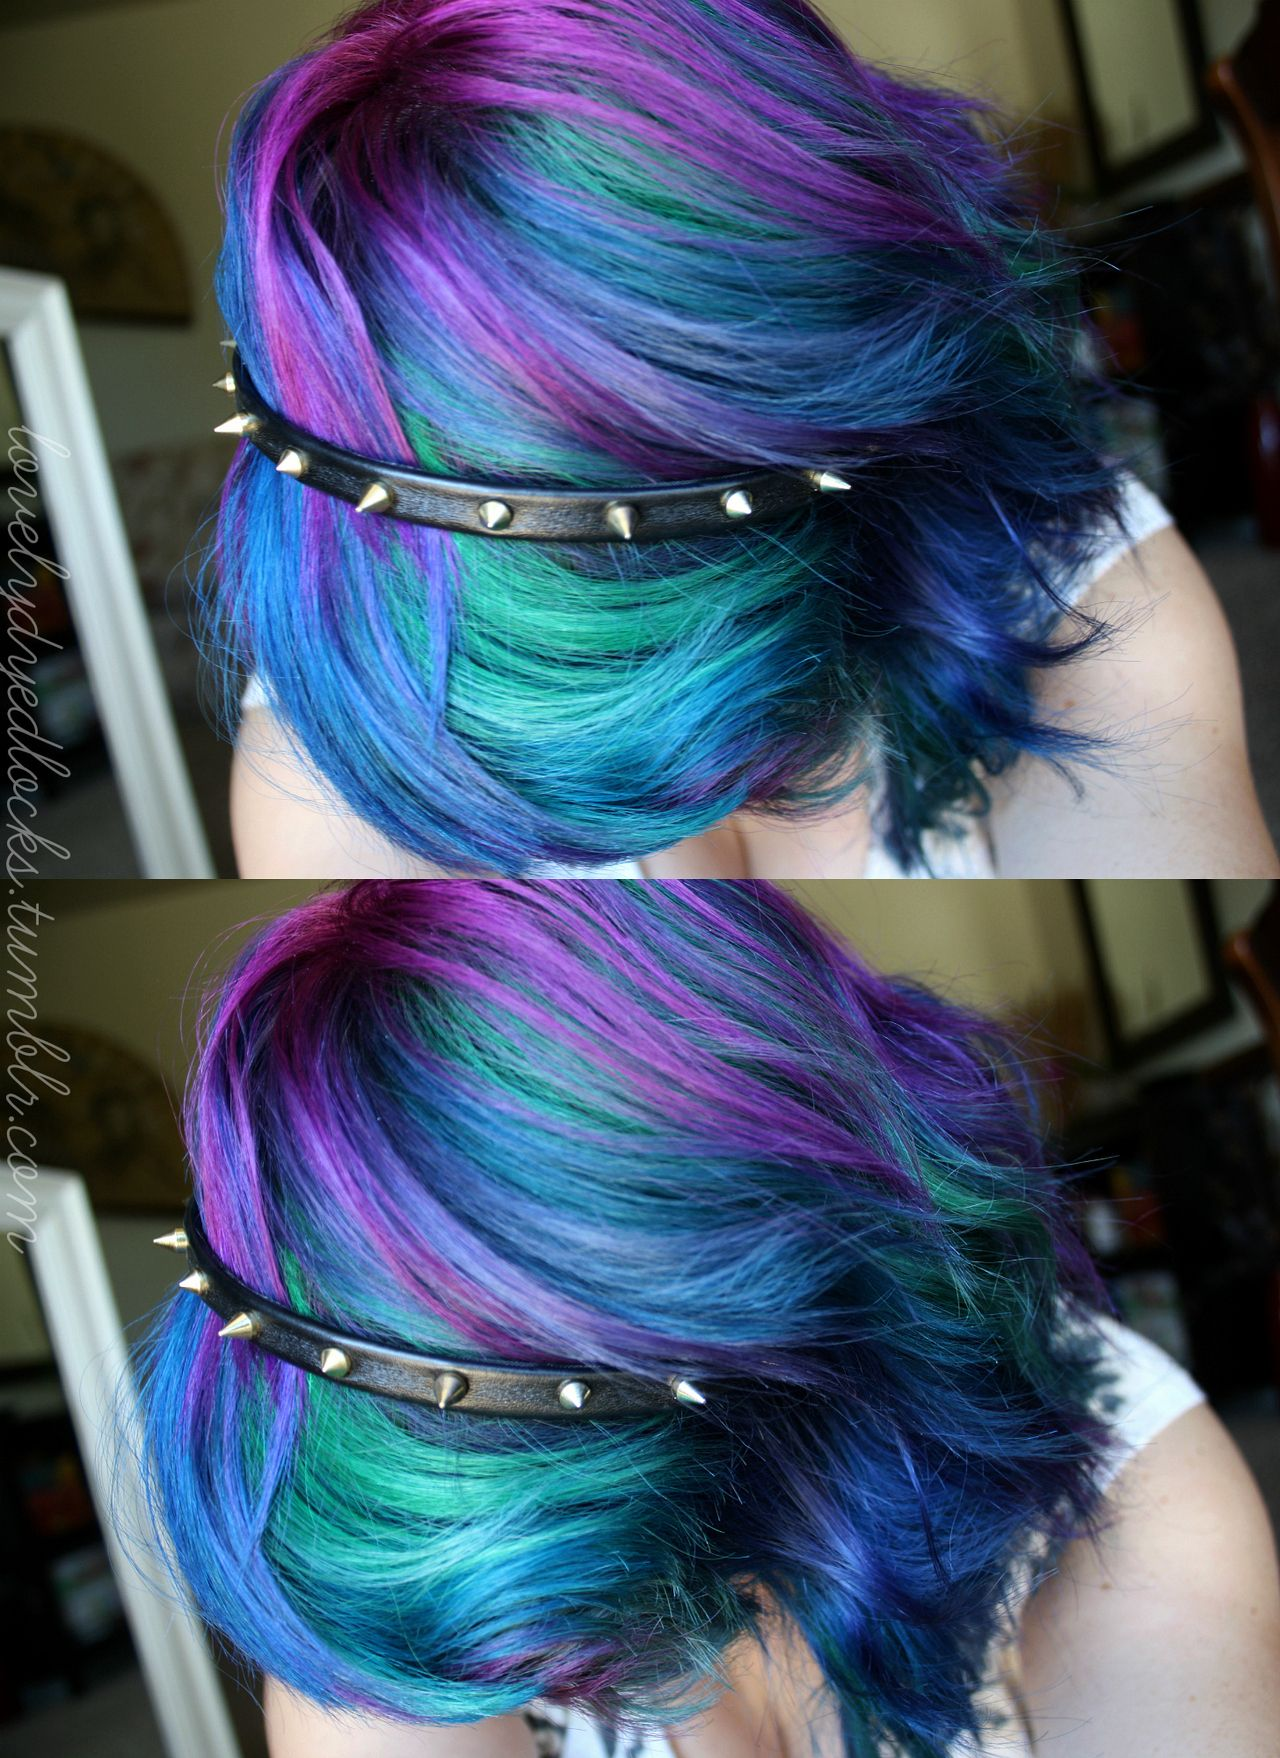 hair dyes bring